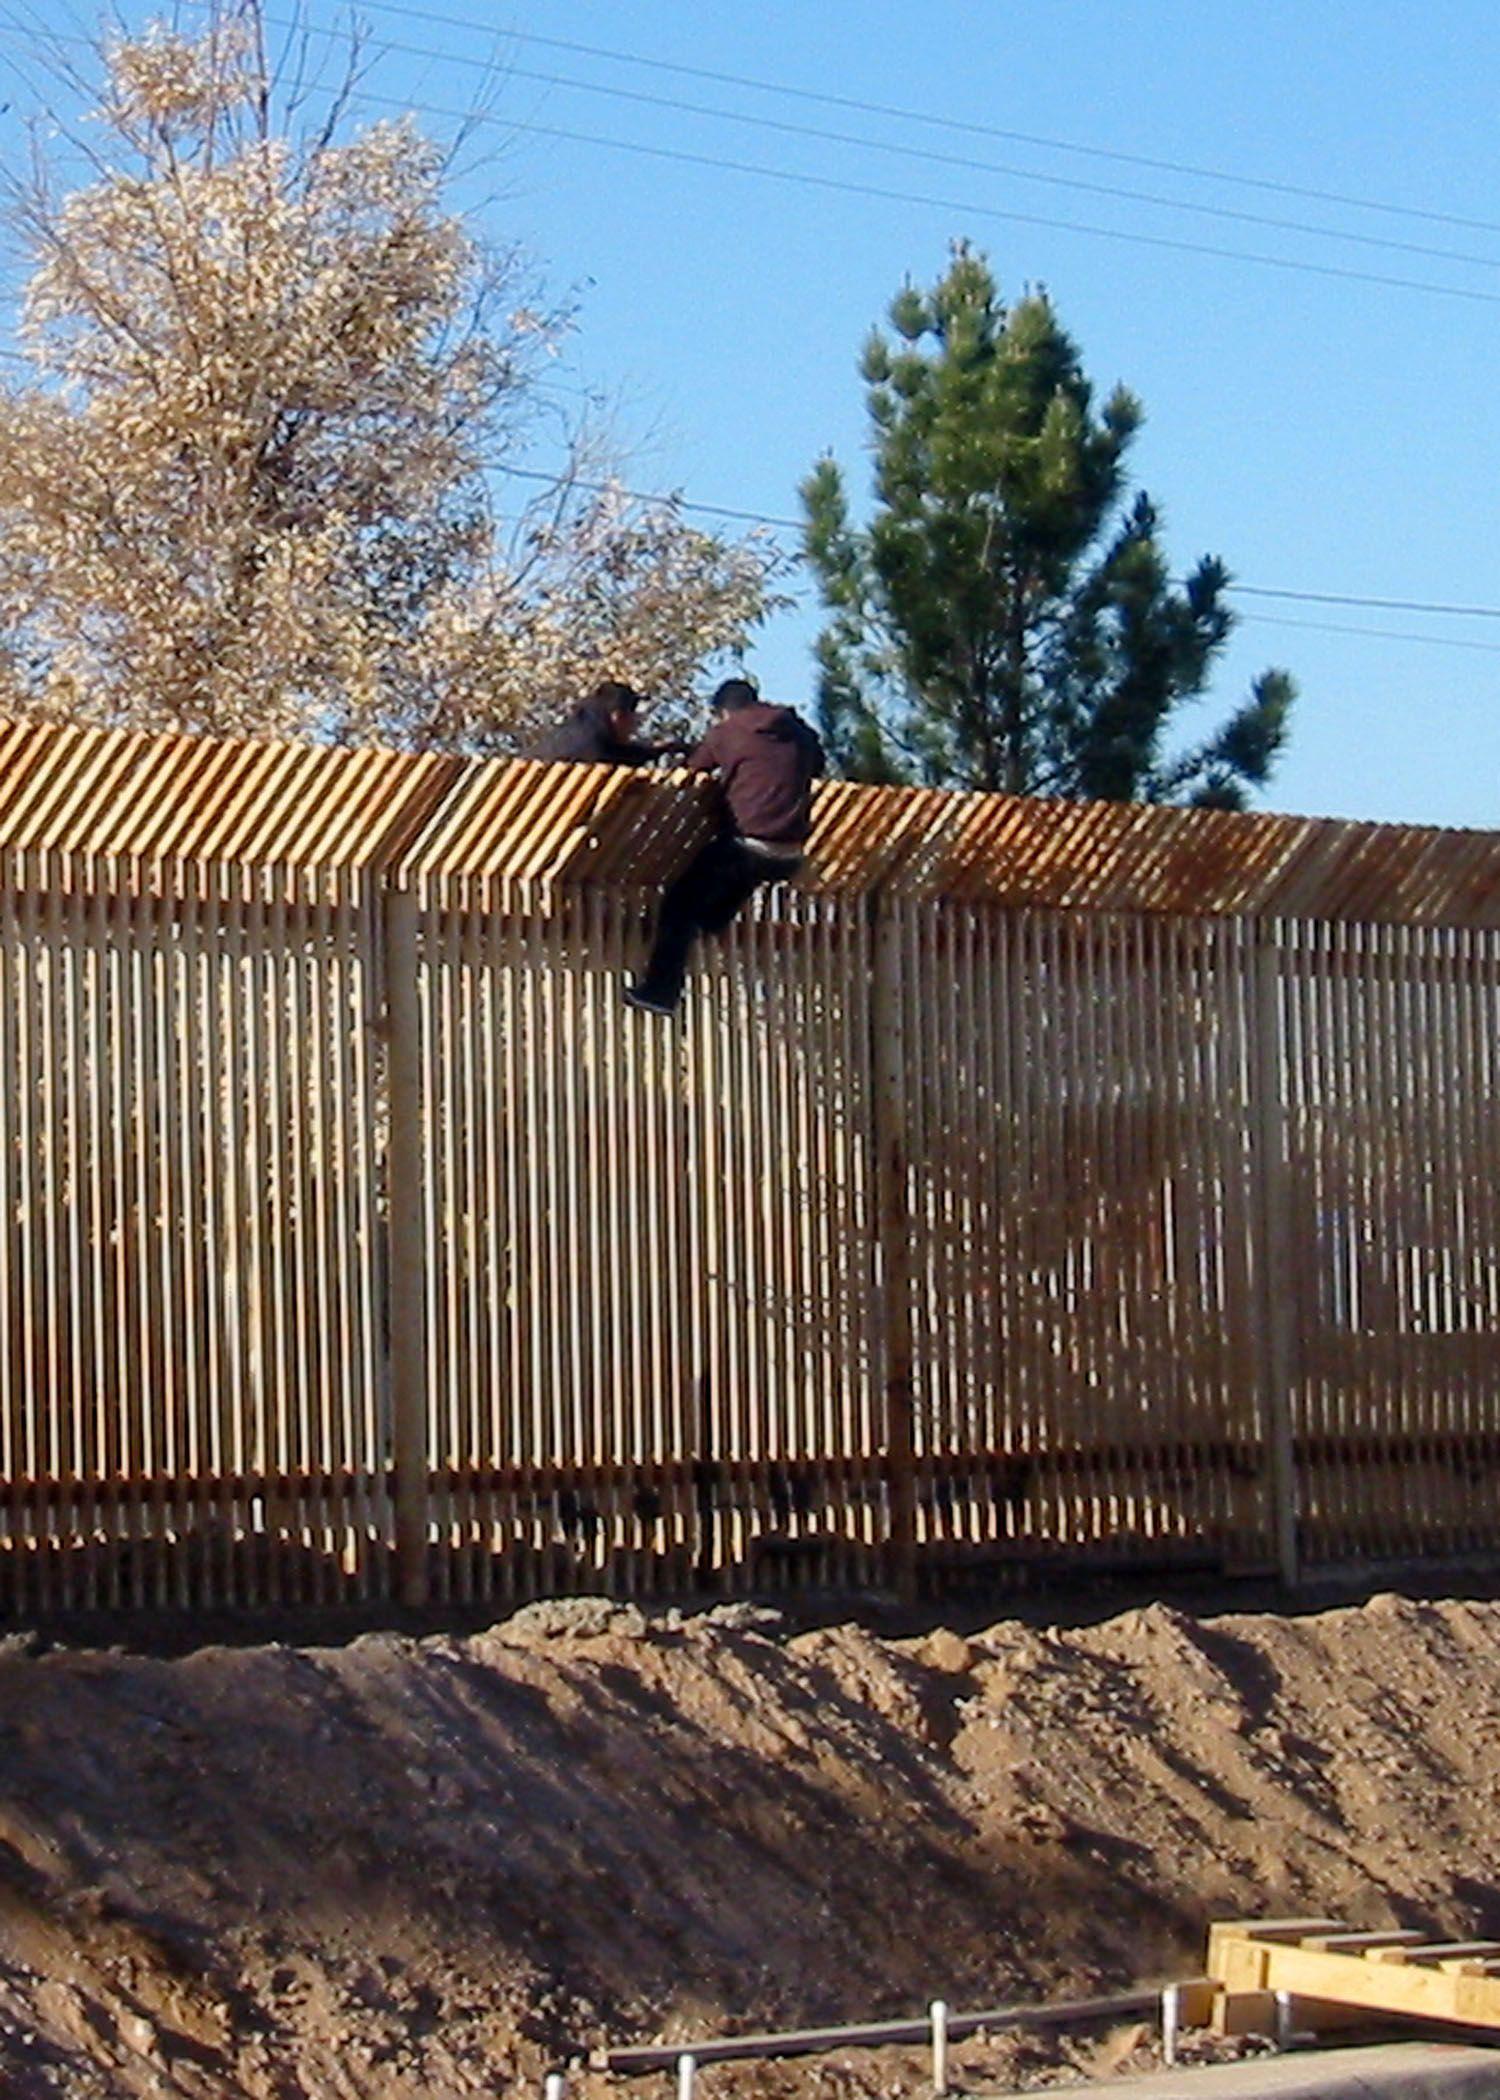 USA Mexico border fence USA / Mexico Border Fence